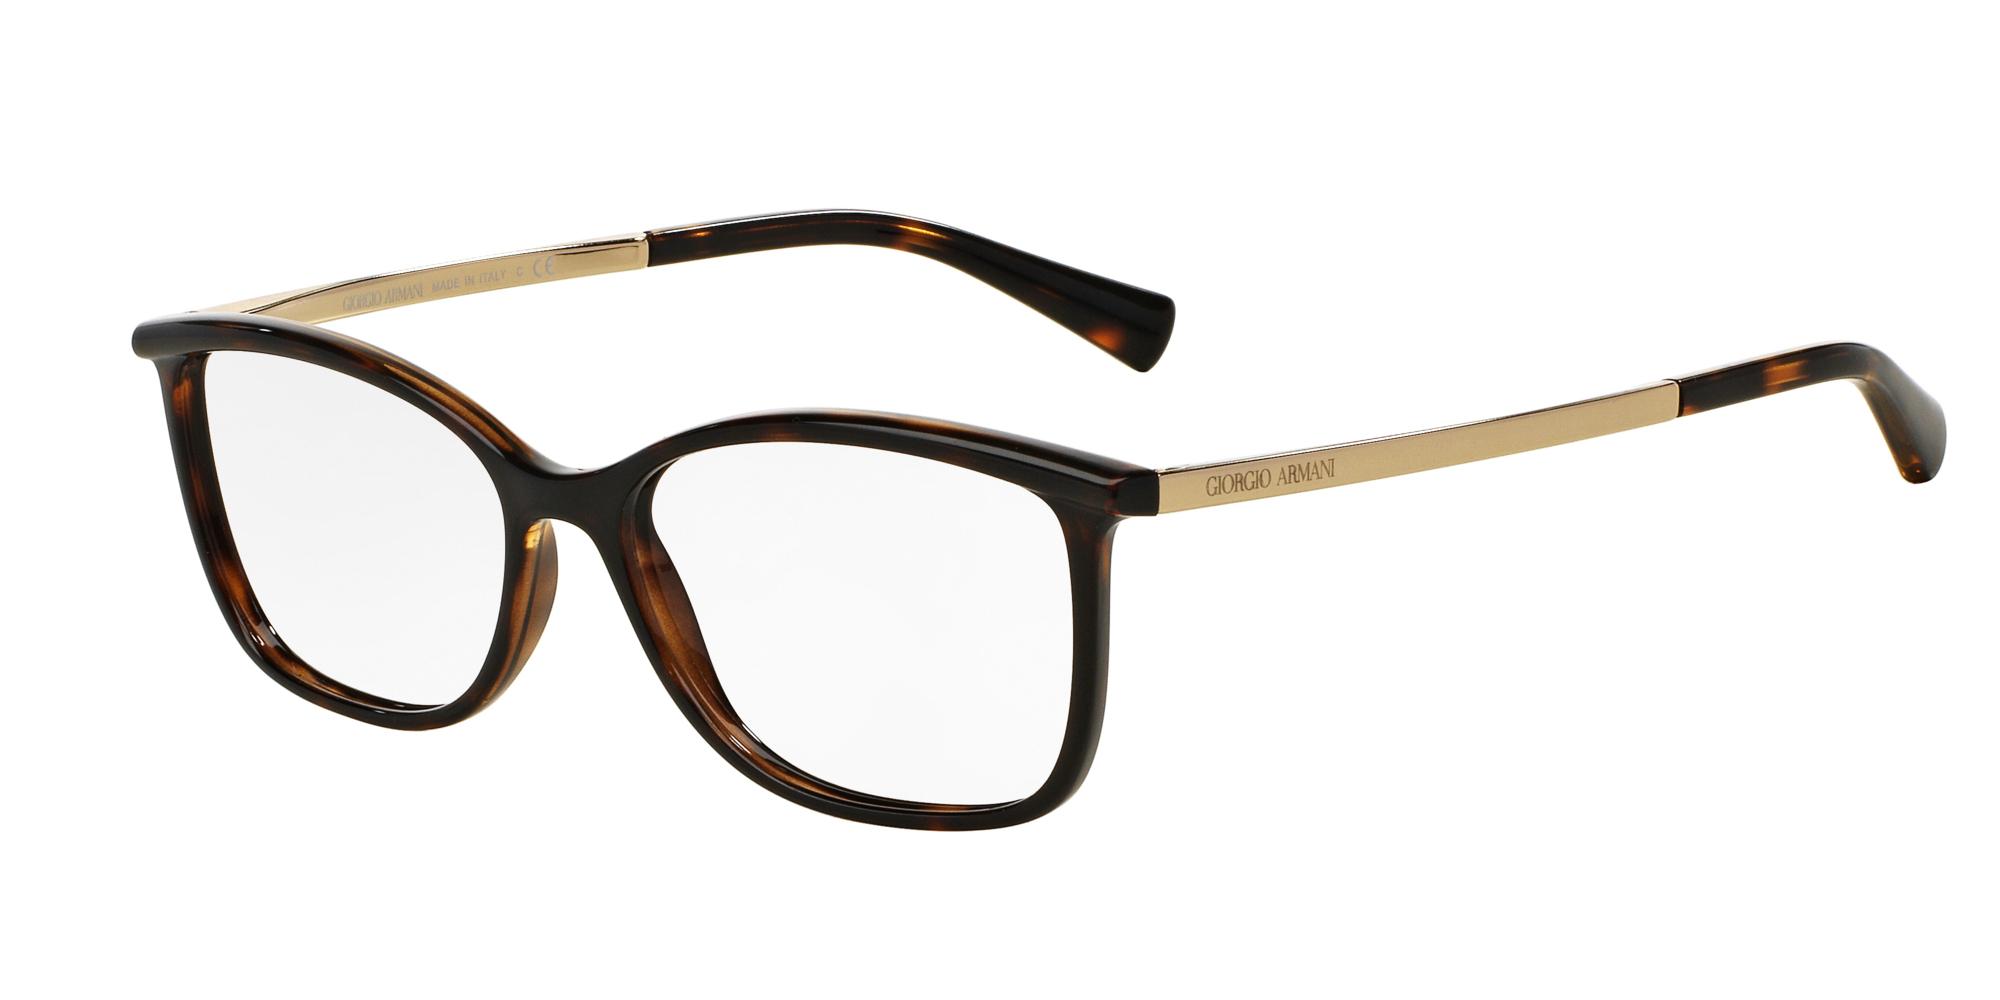 Armani Brille 0AR7093535026 bei ROTTLER